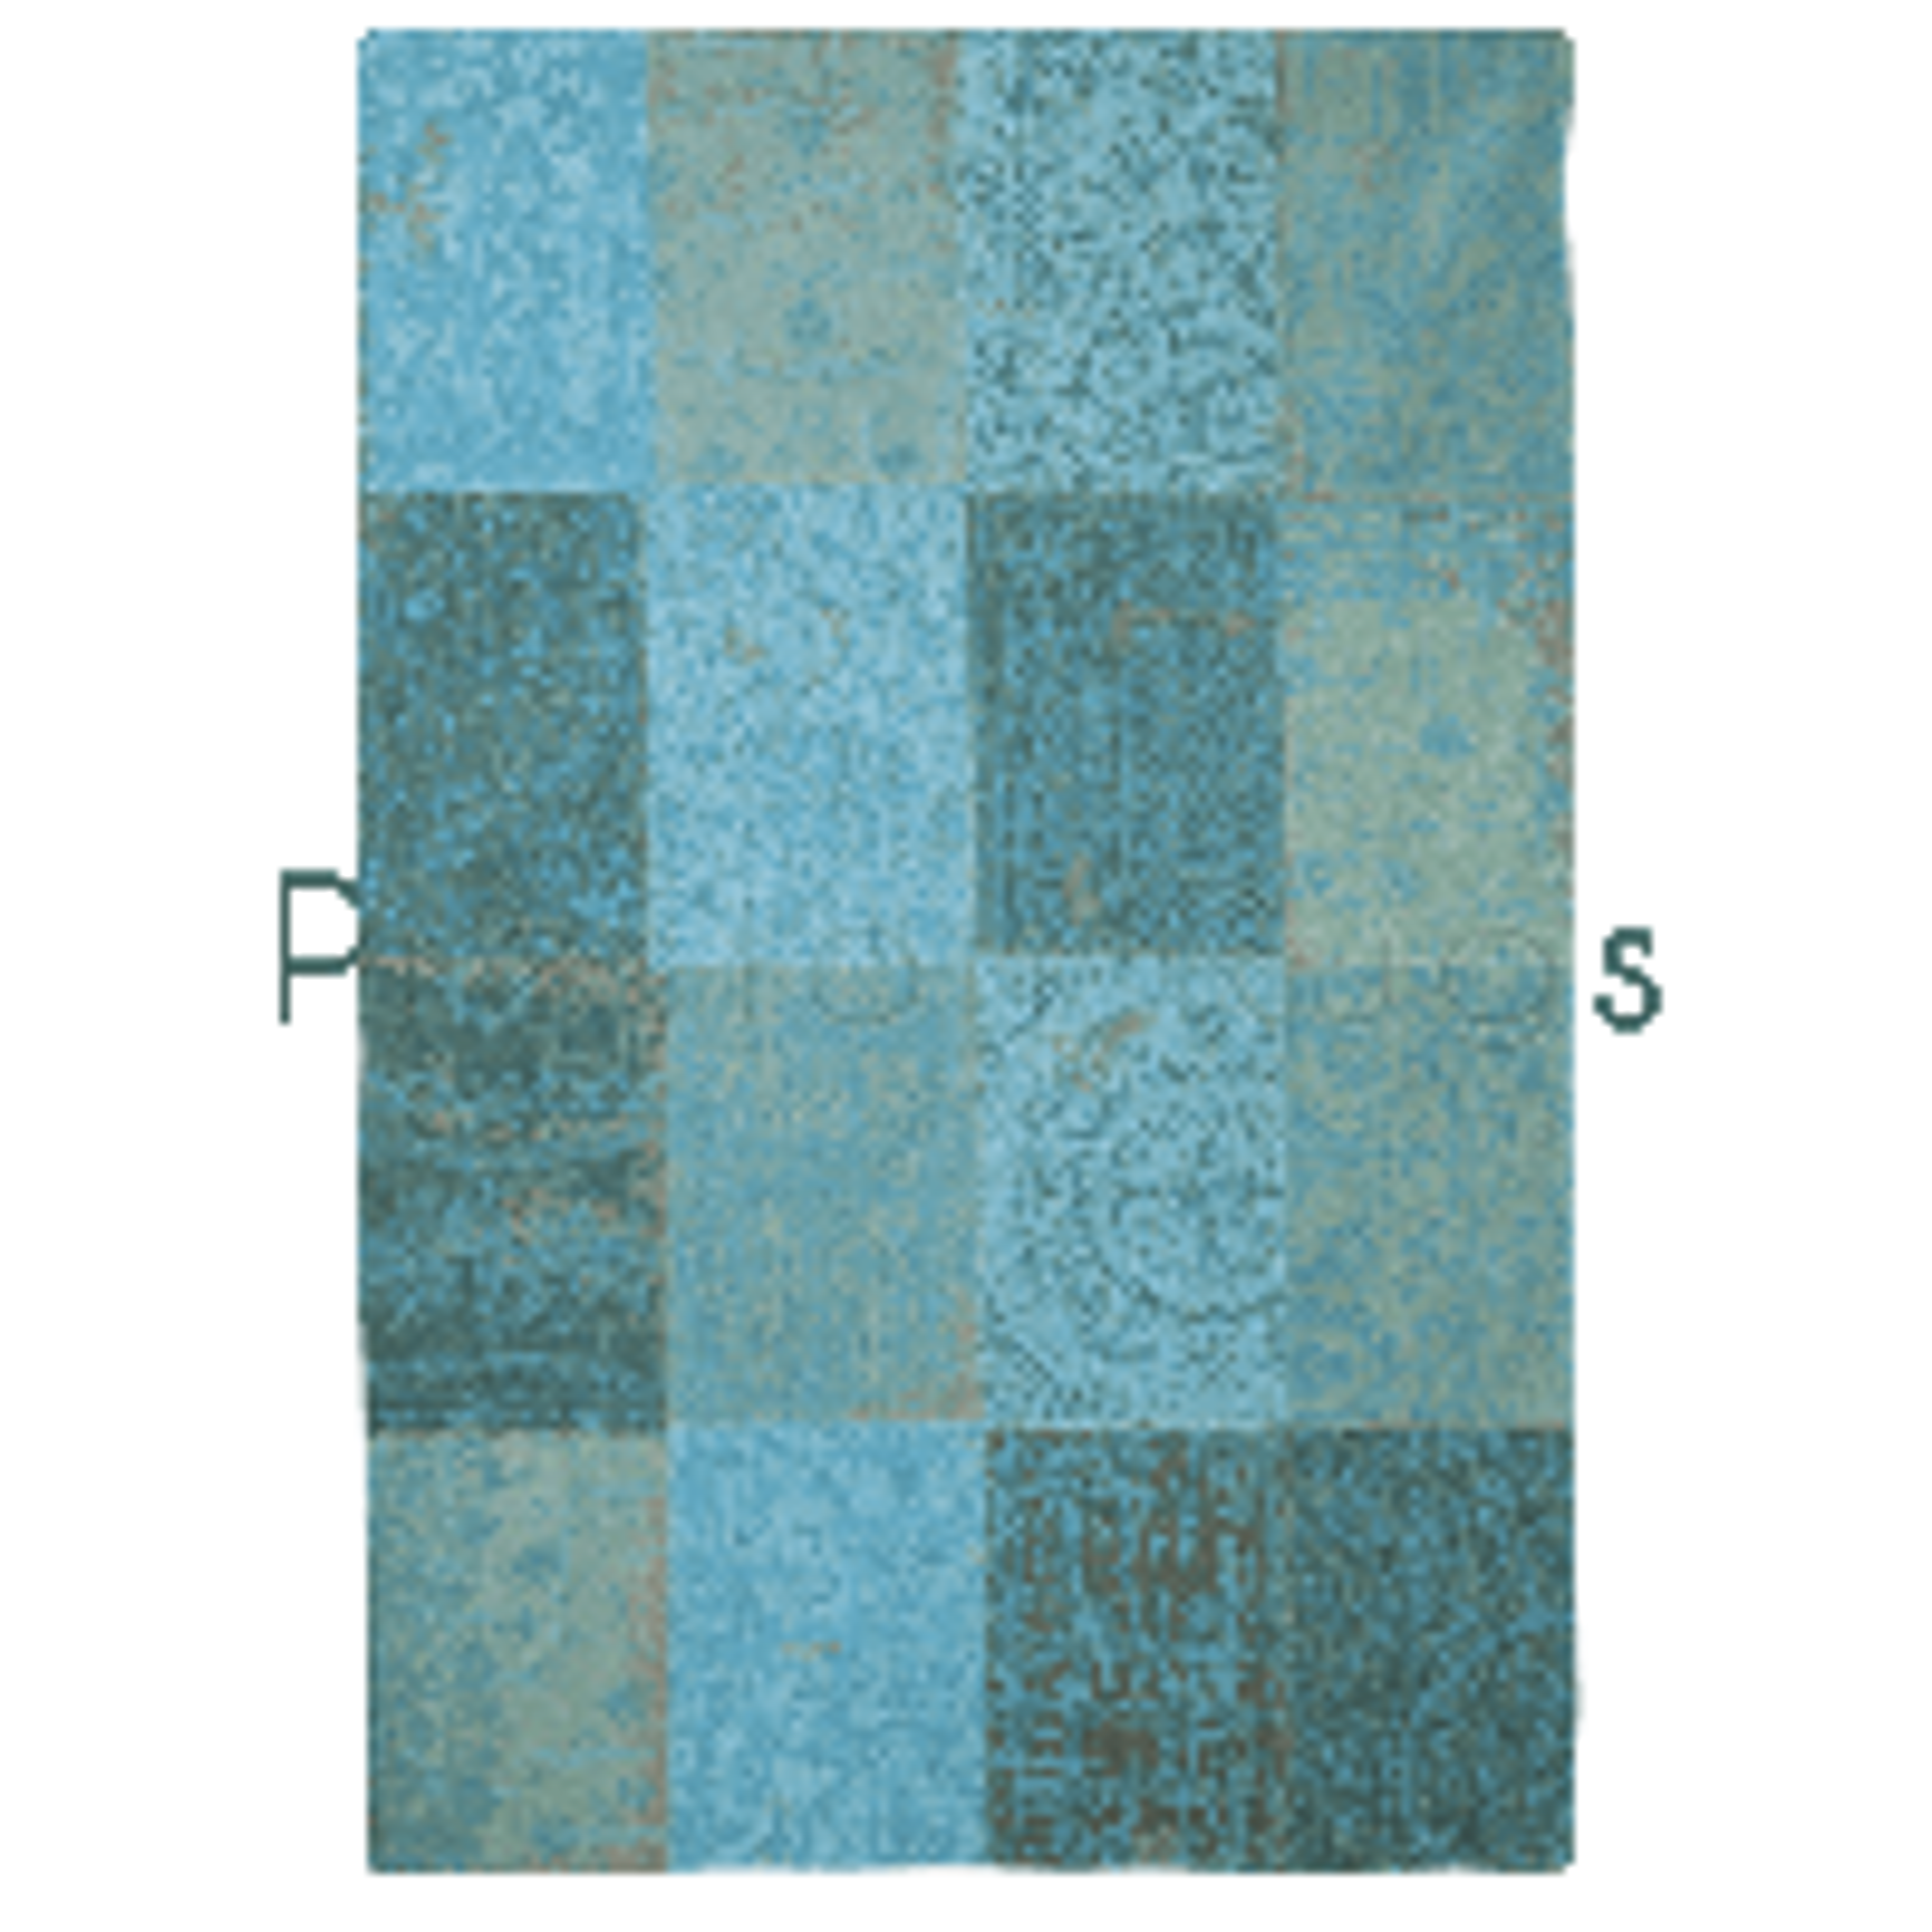 "New Vintage Azur 8015 Rug by Louis de Poortere-Runner 76 x 300 cm (2'6"" x 9'10"")"